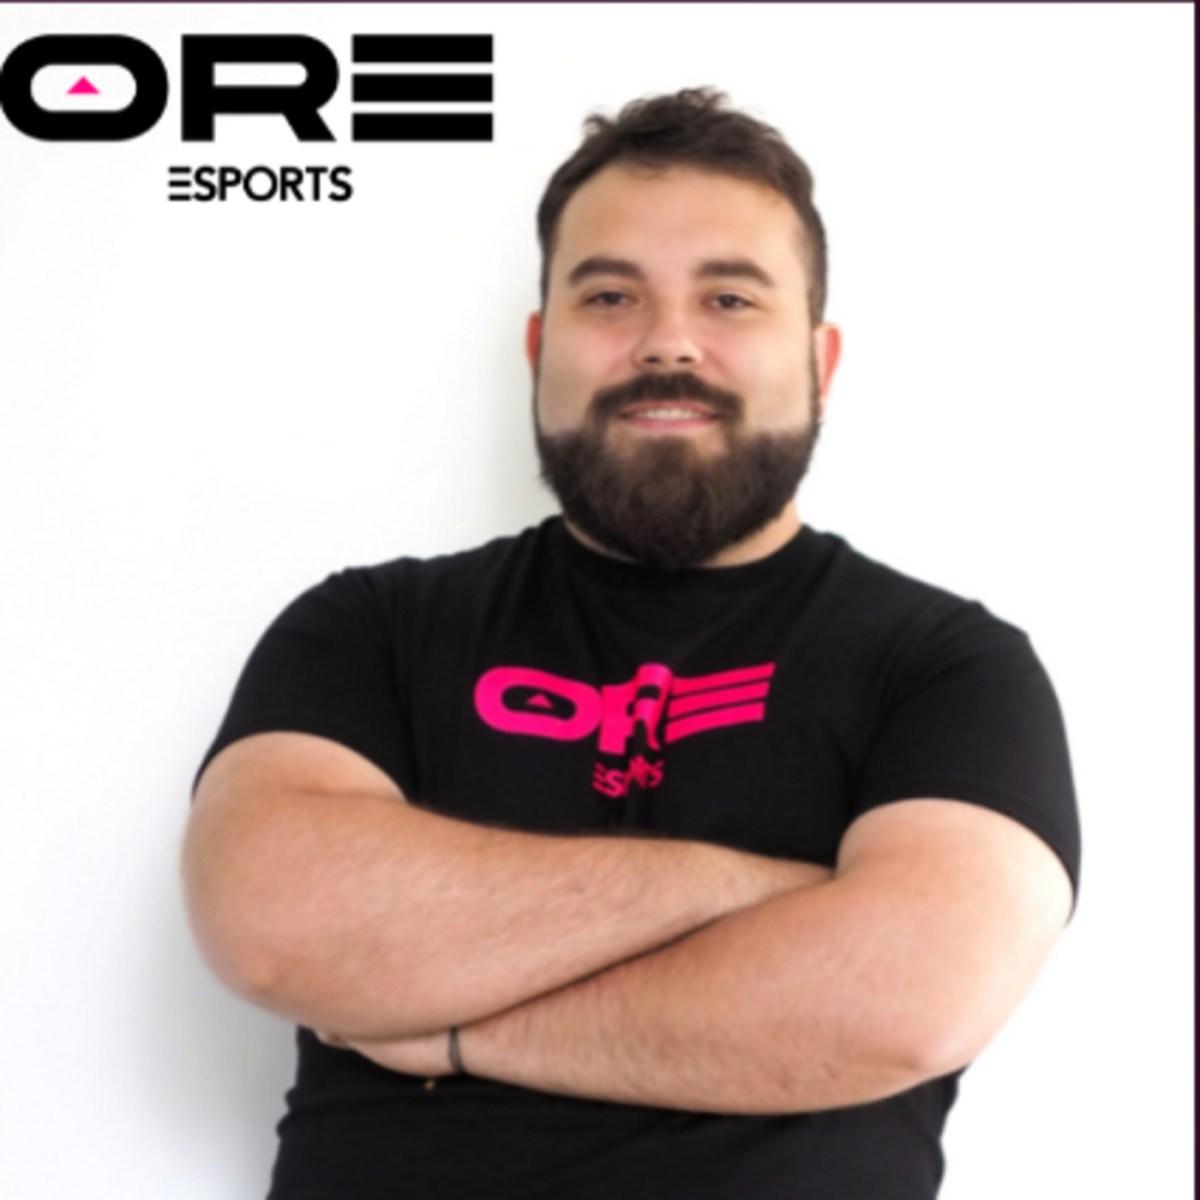 #ValienteEntrevista20 a Jon Fermín San Julián, director de ORE esports